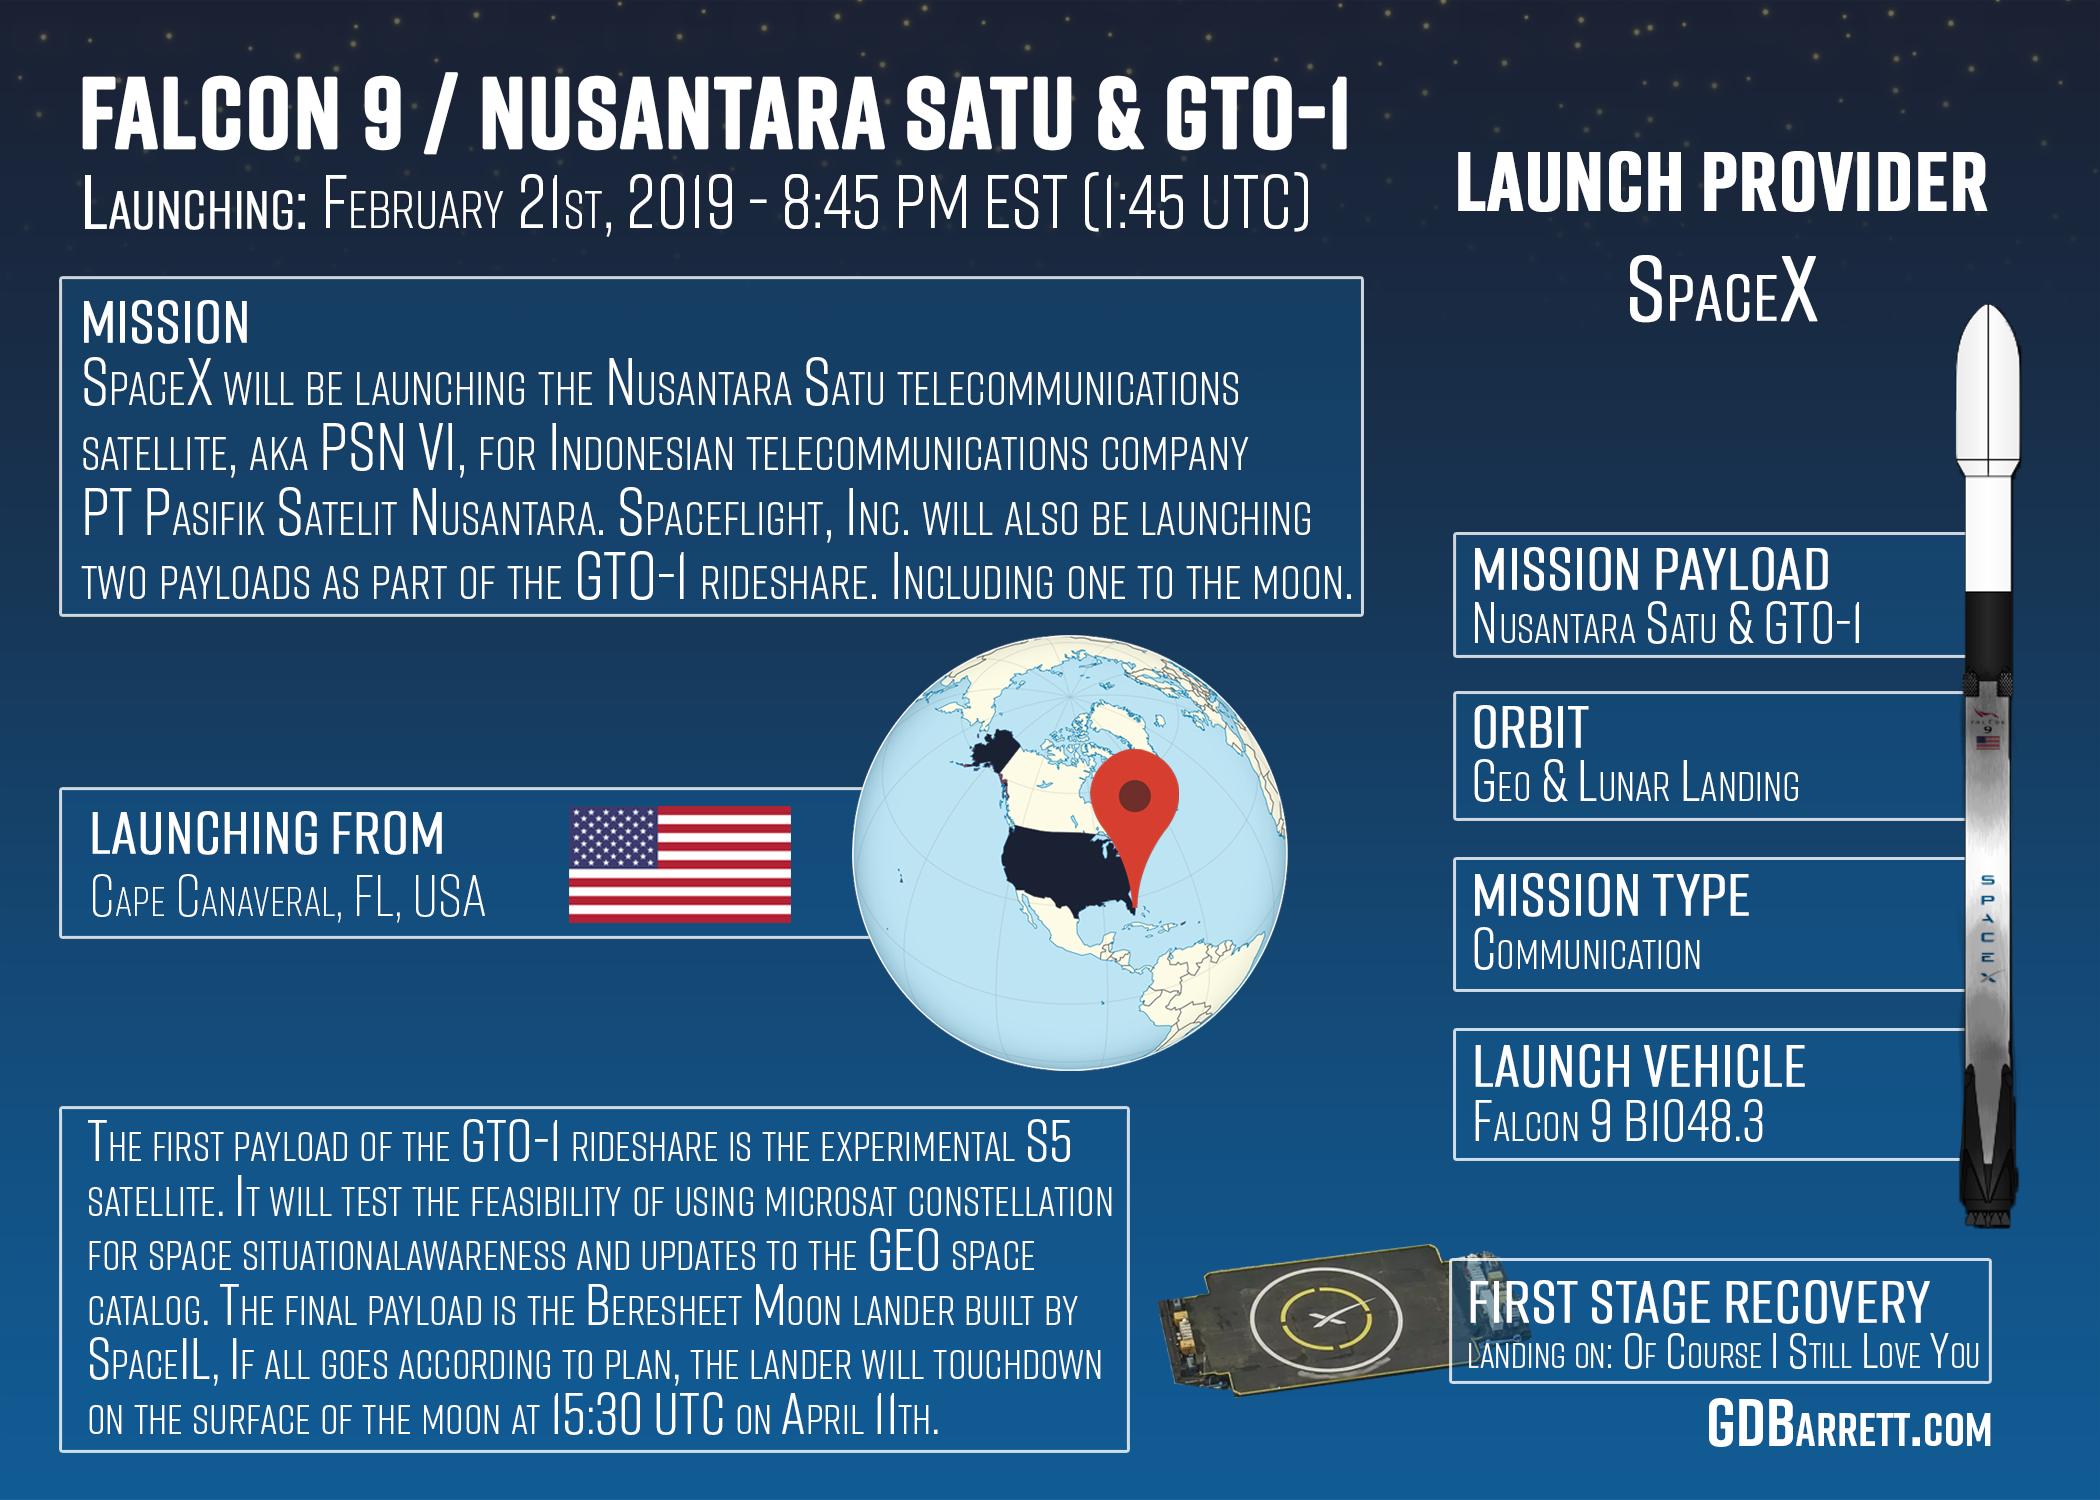 SpaceX Falcon 9 Nusantara SATU & GTO-1